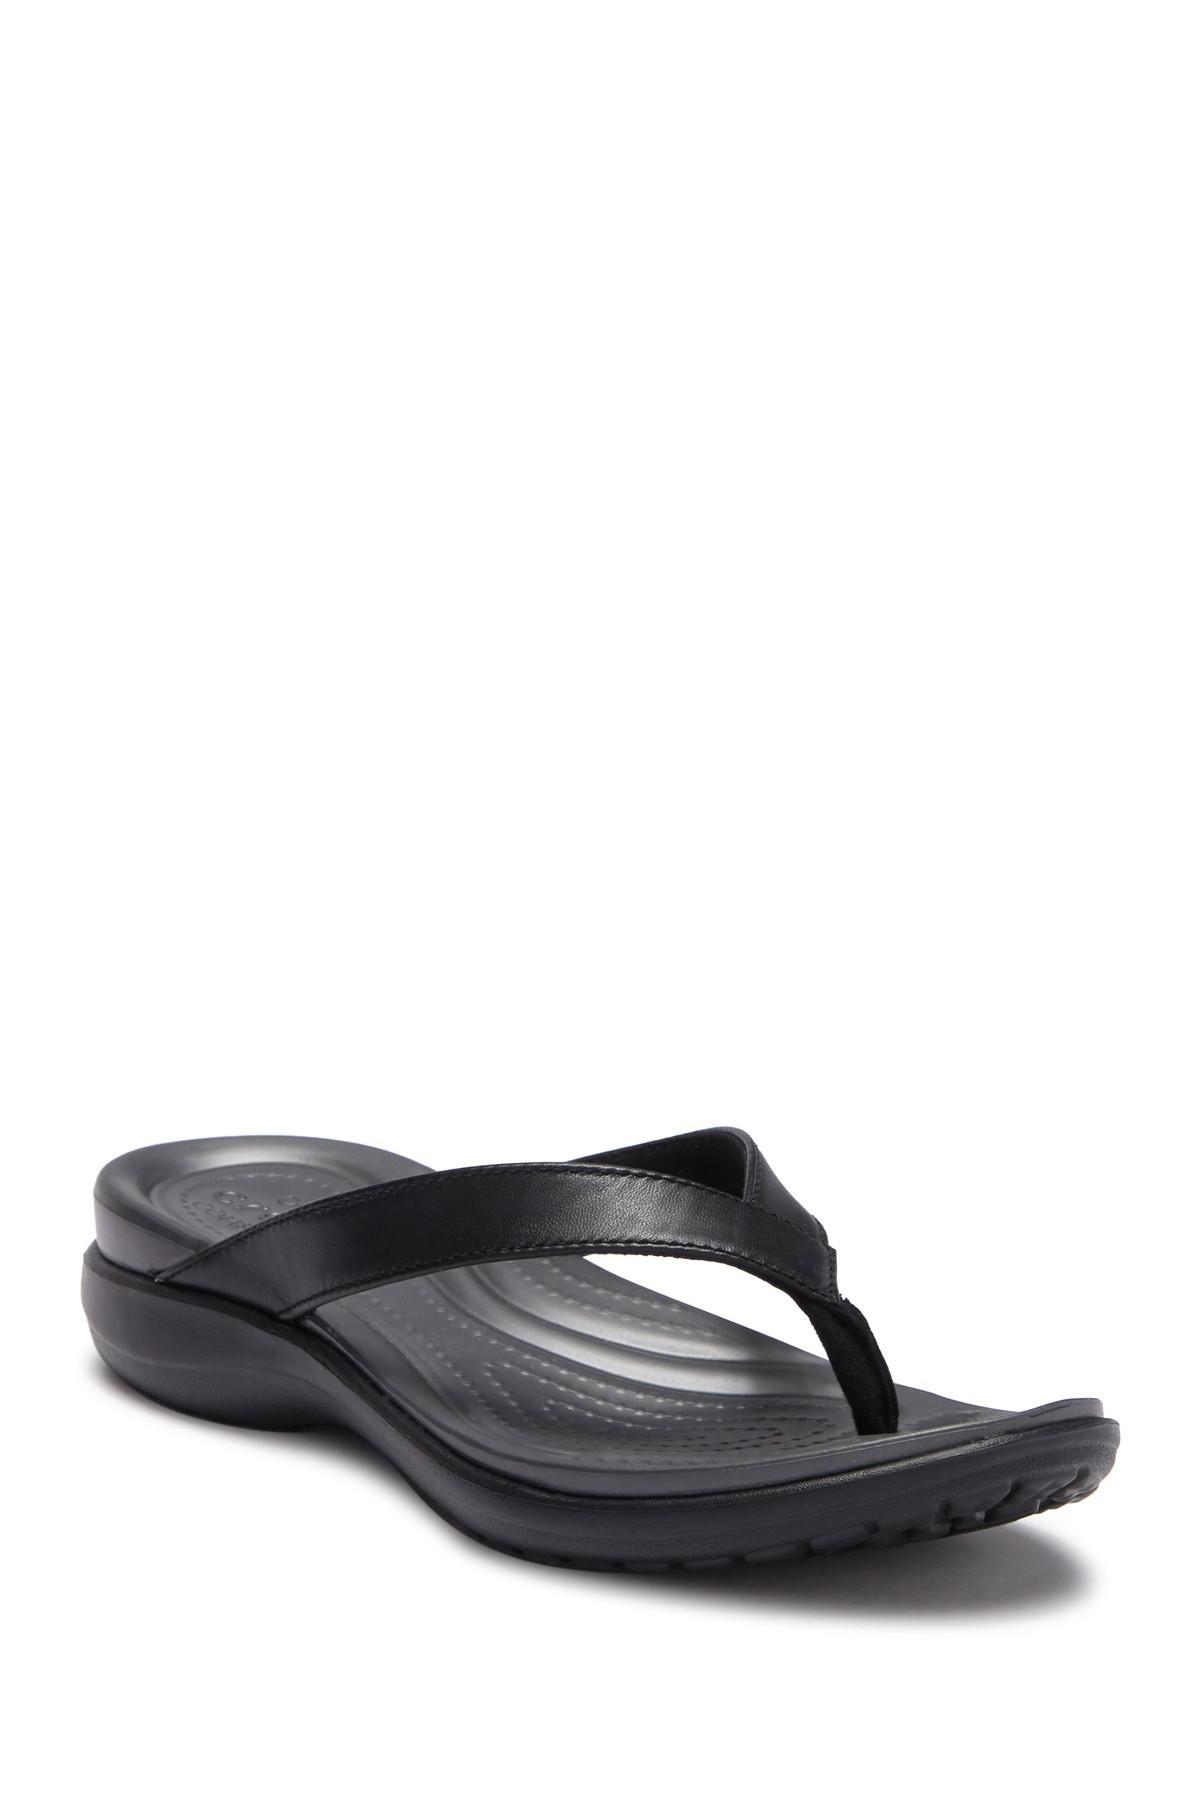 0f81ec2ceaba Lyst - Crocs™ Capri V Flip Flop Sandal in Black